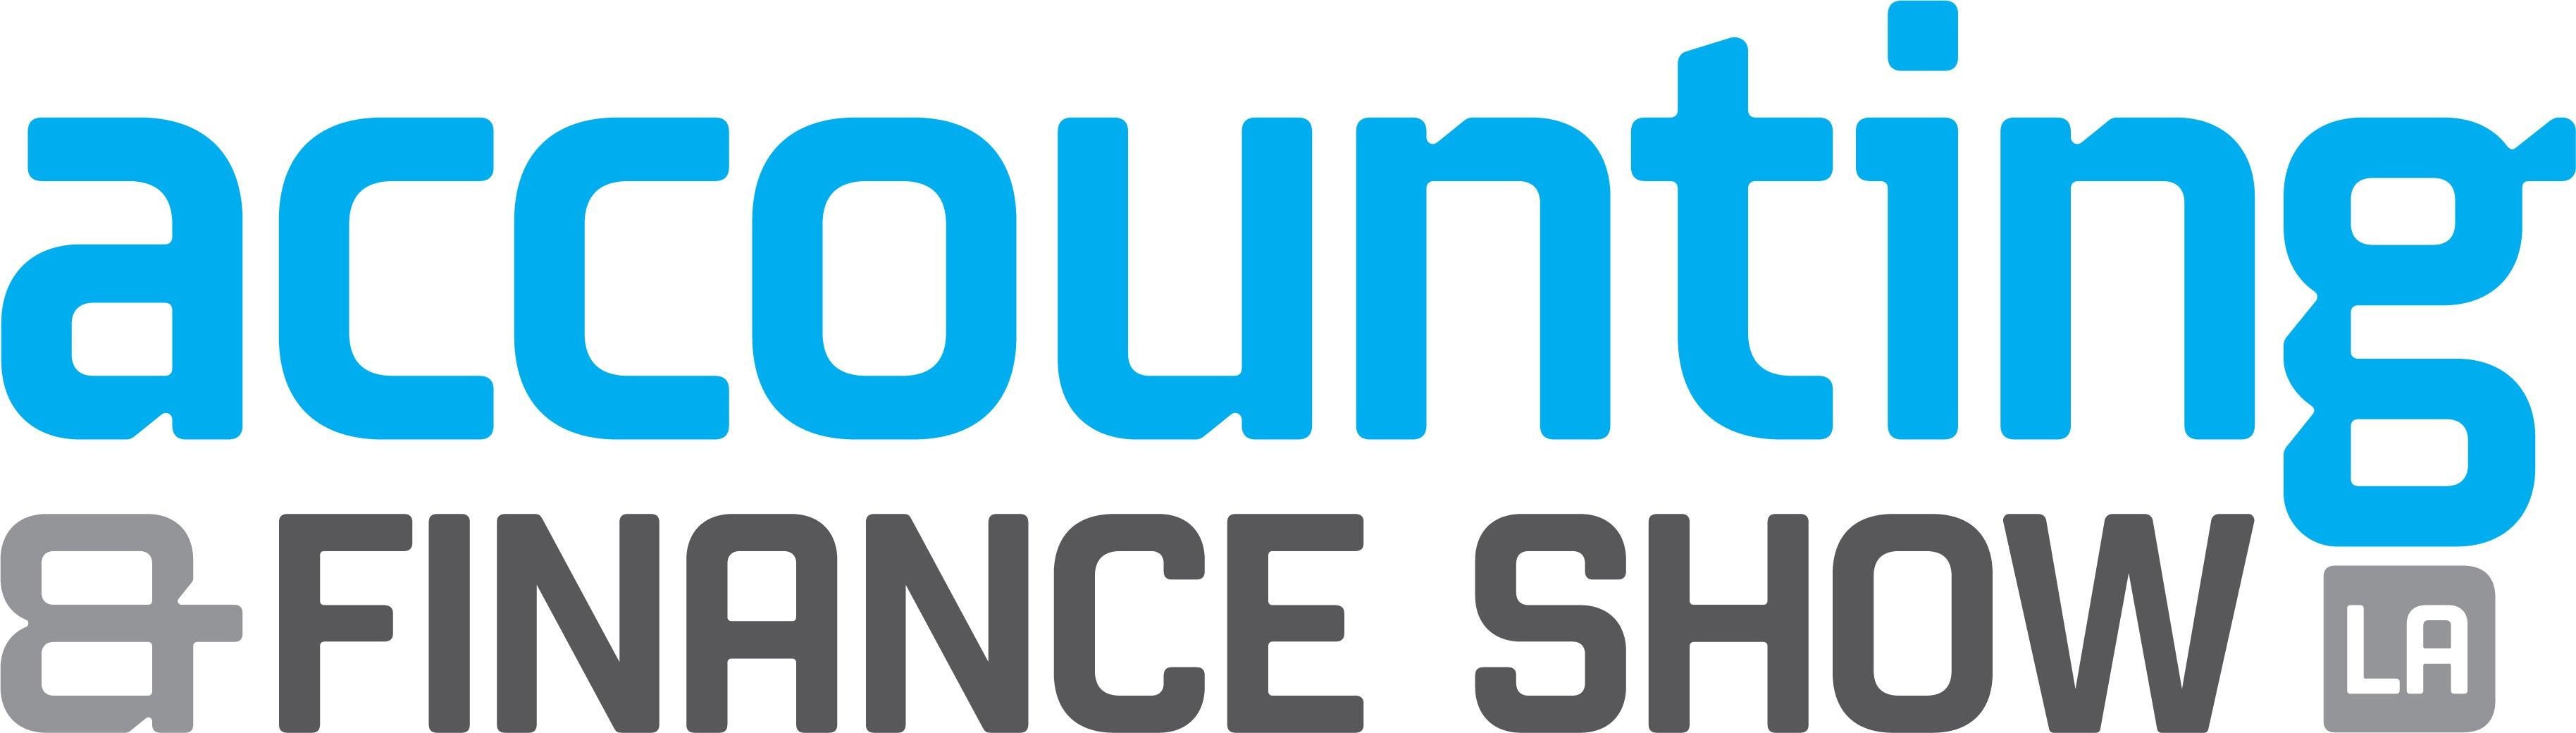 ACCOUNT&FIN; SHOW Logo LA FC.JPG